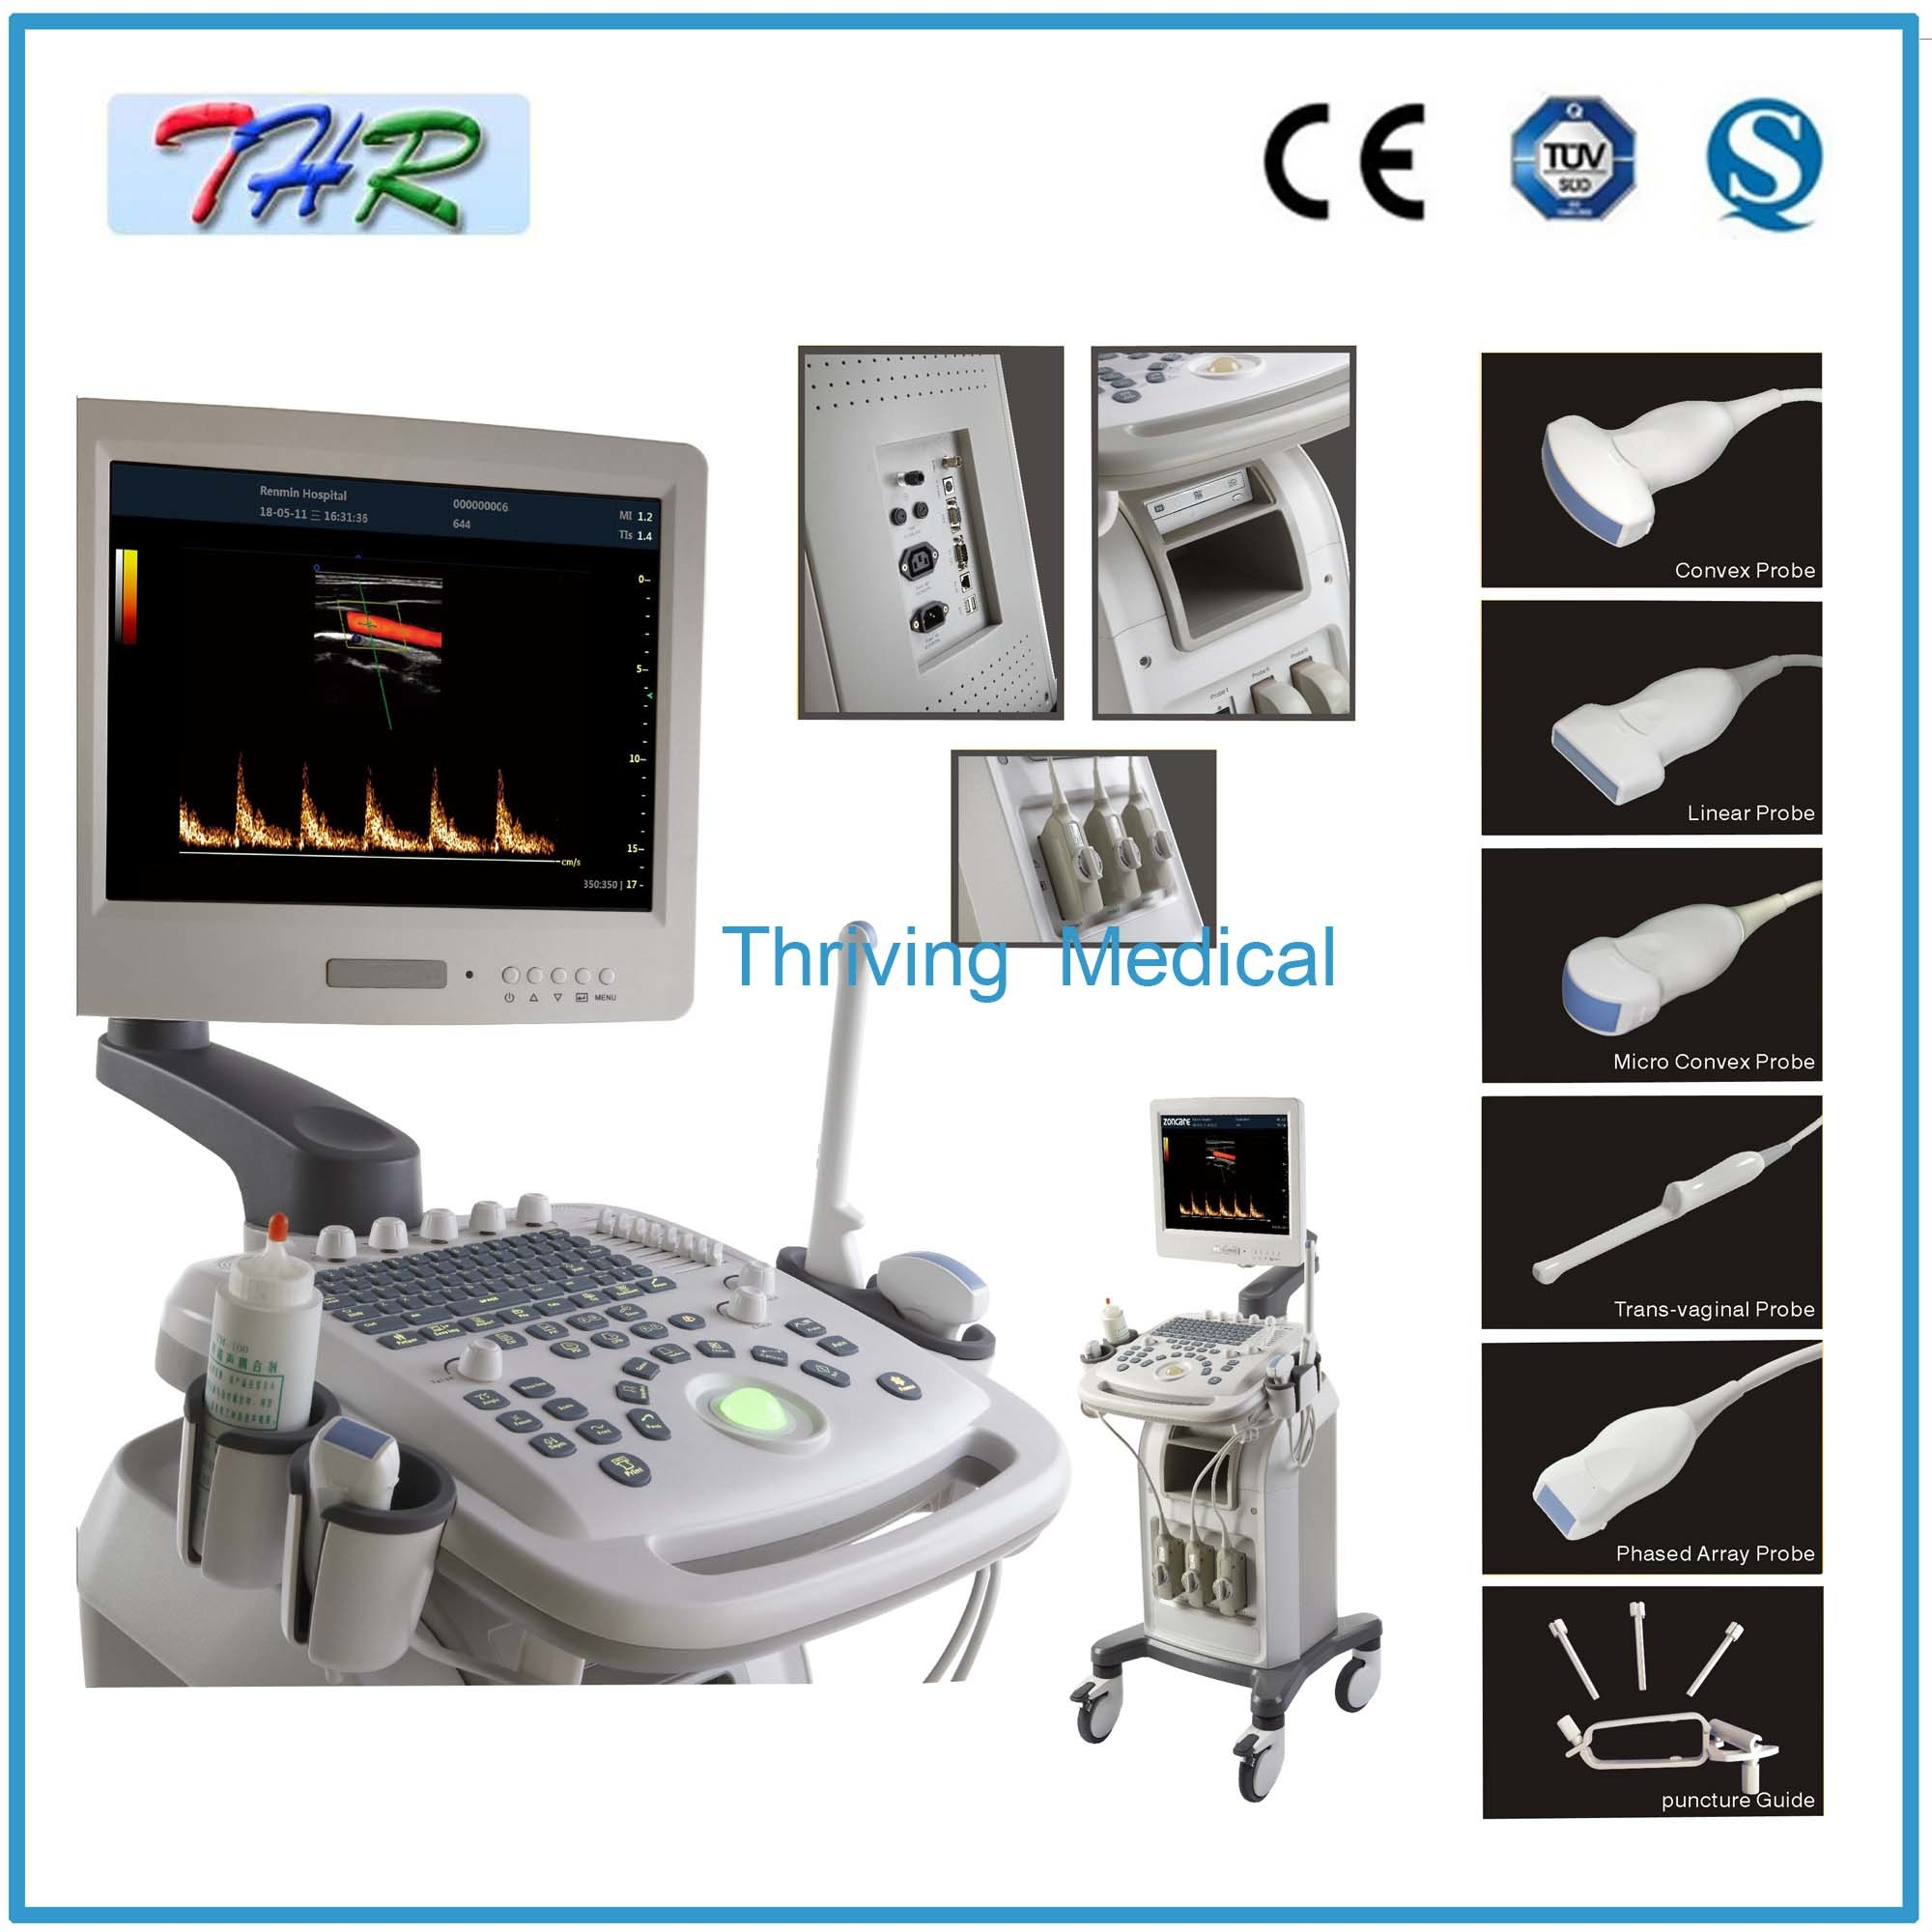 3d 4d ultrasound machine price